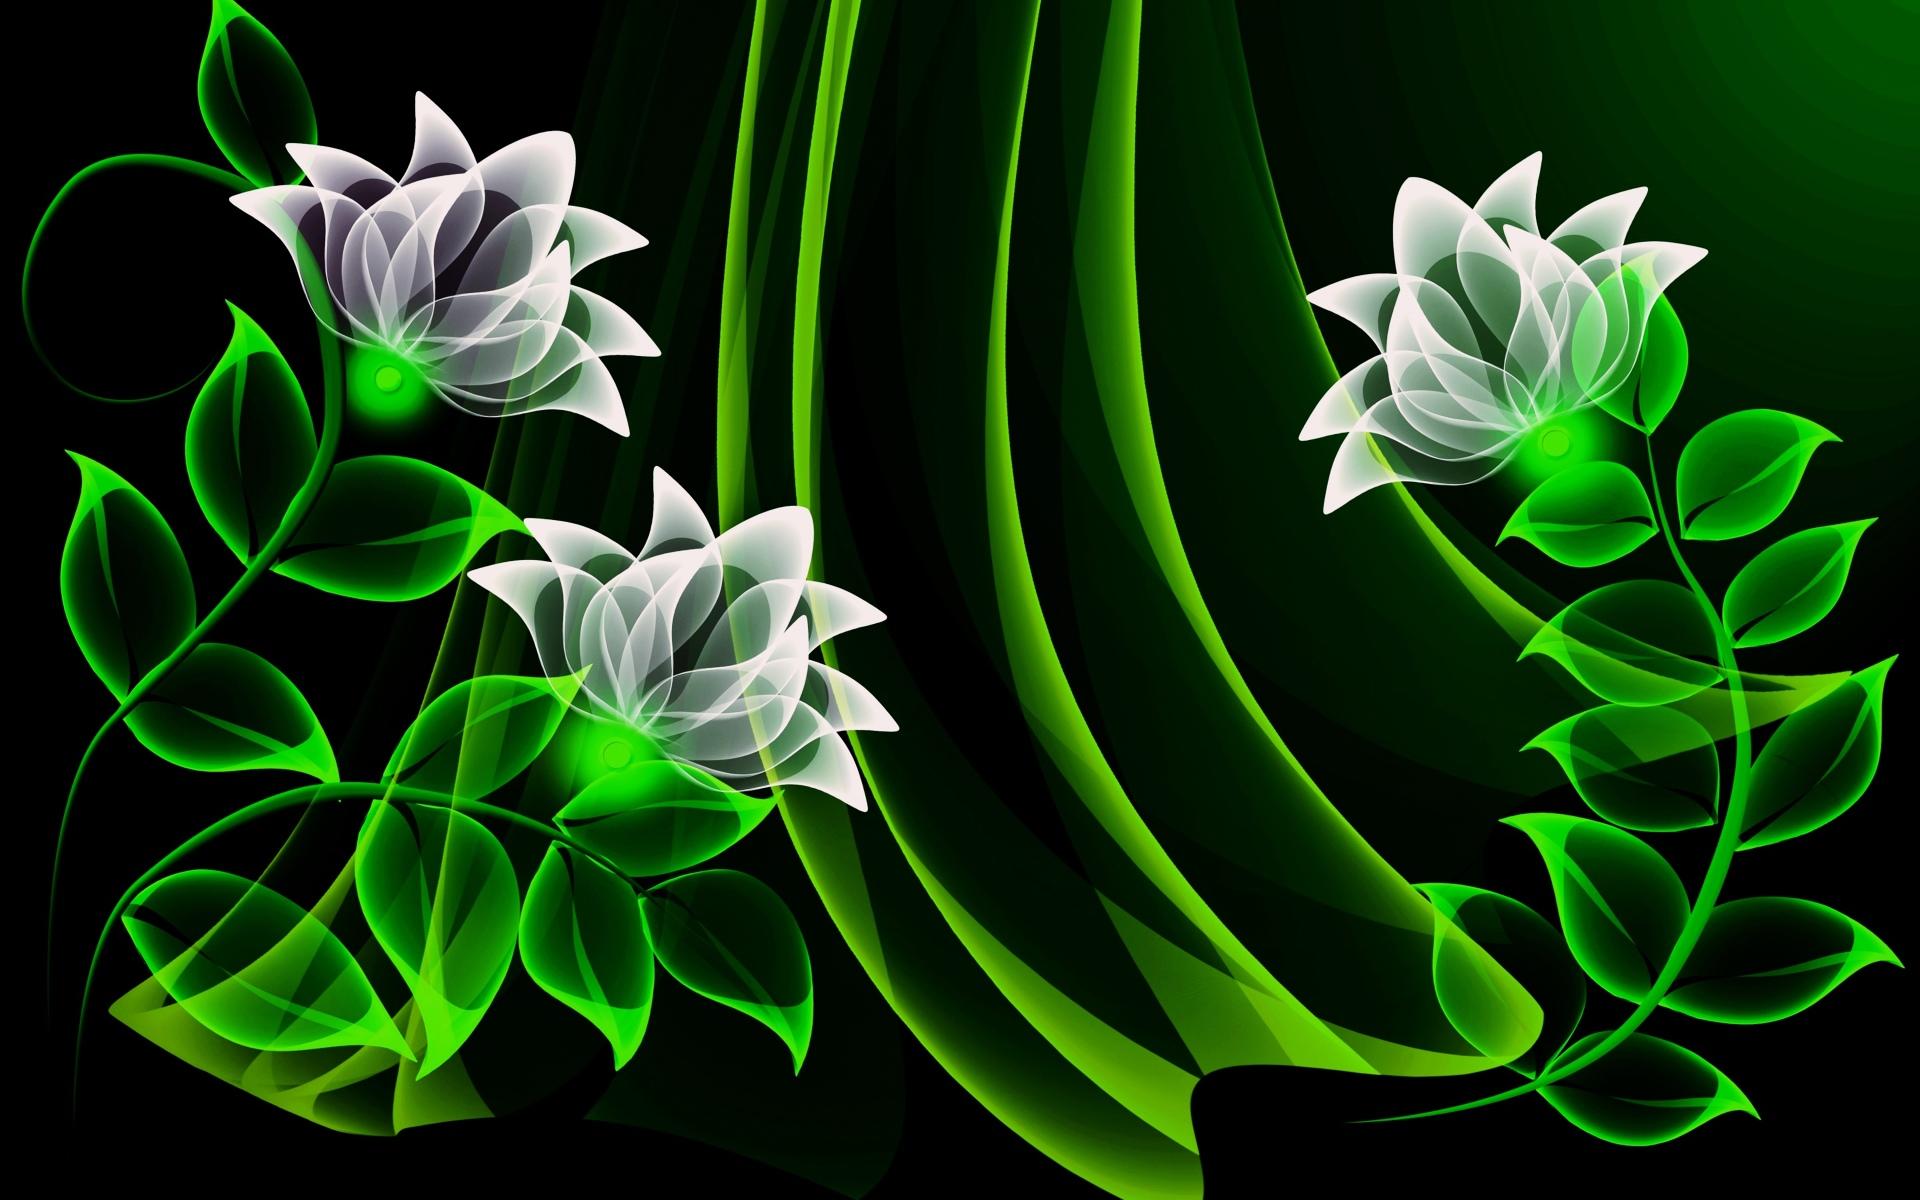 Fondos de flores wallpapers hd gratis for Imagenes abstractas 3d